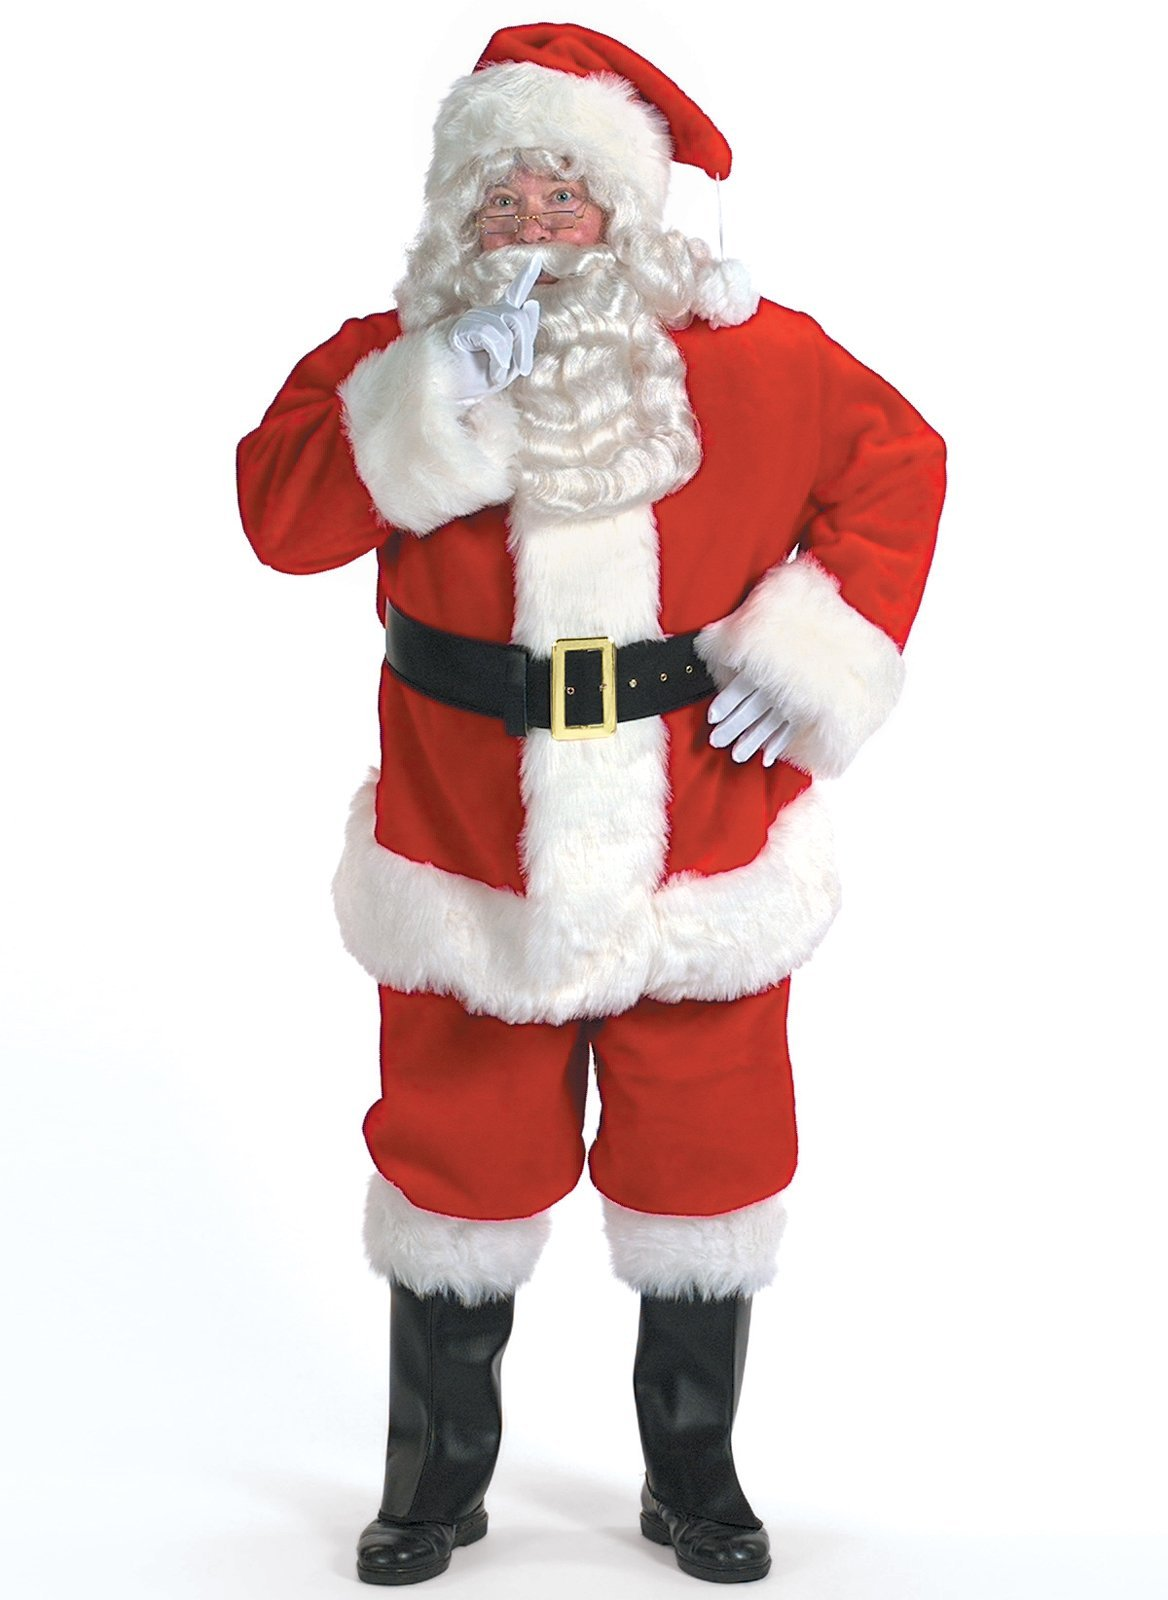 Halco Holidays Men's Professional Santa Claus Suit Costume, Size 58-62